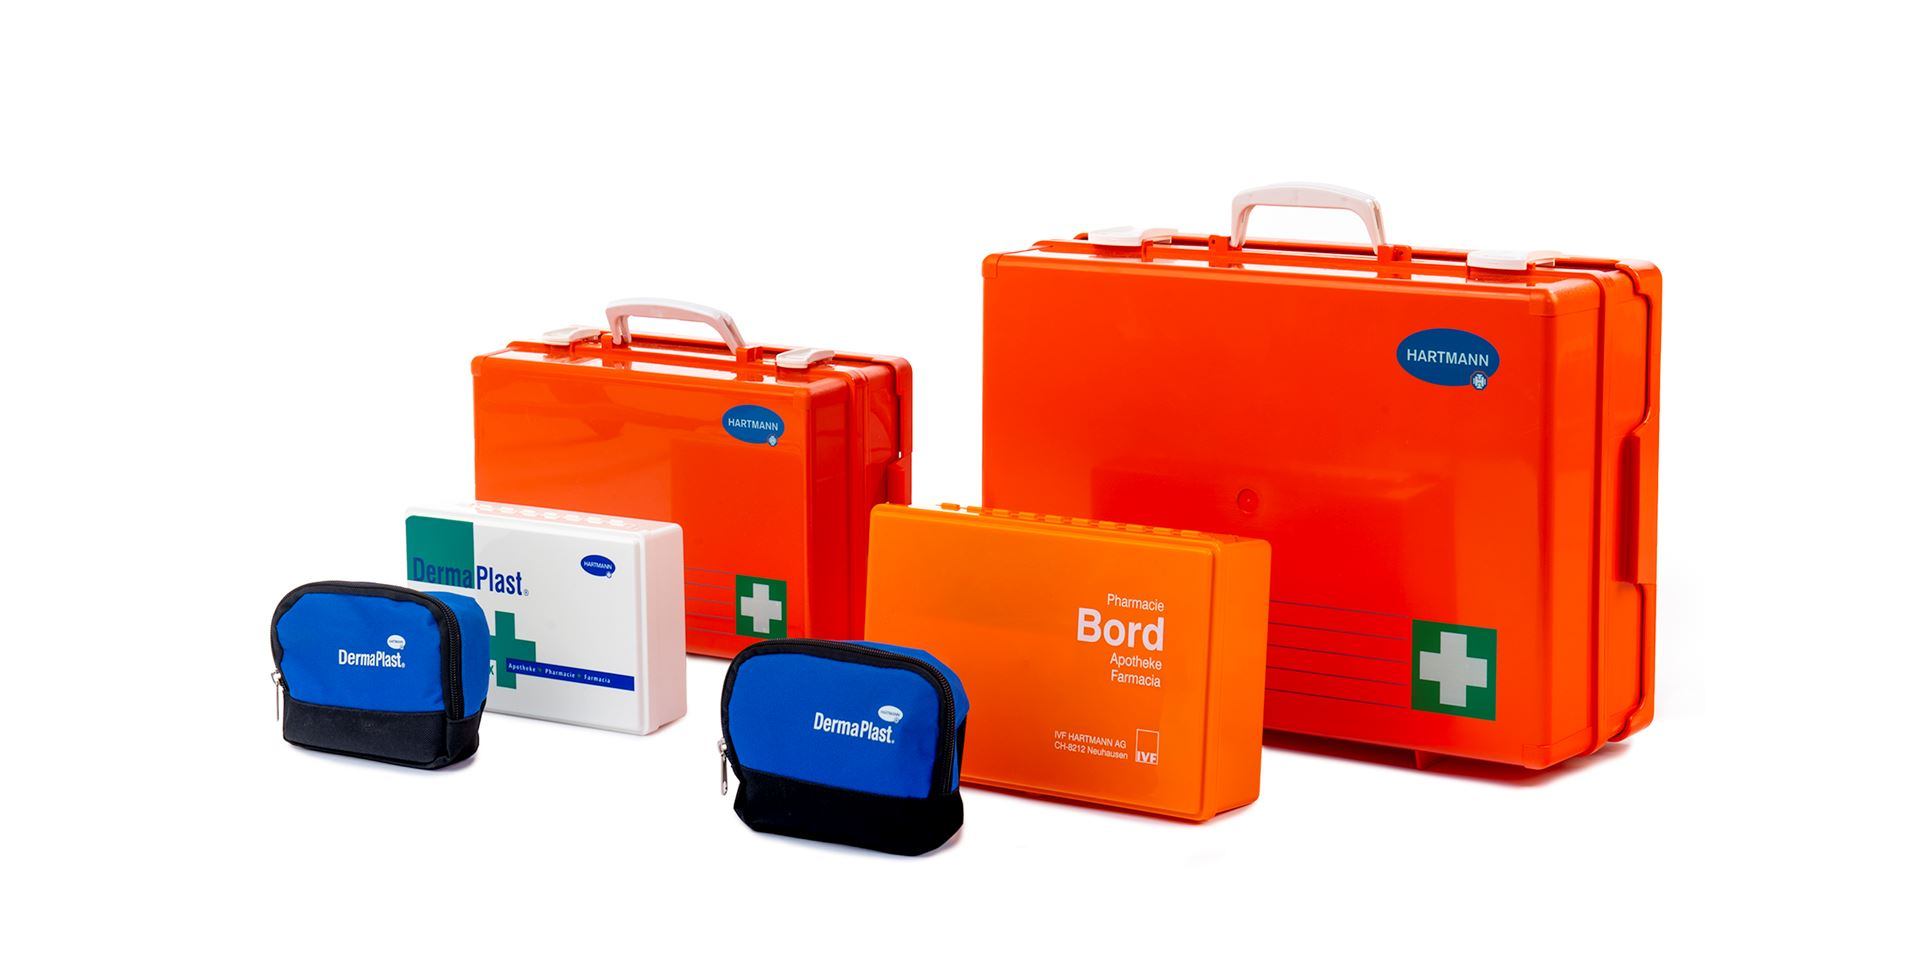 Bild für Kategorie Erste-Hilfe-Sets